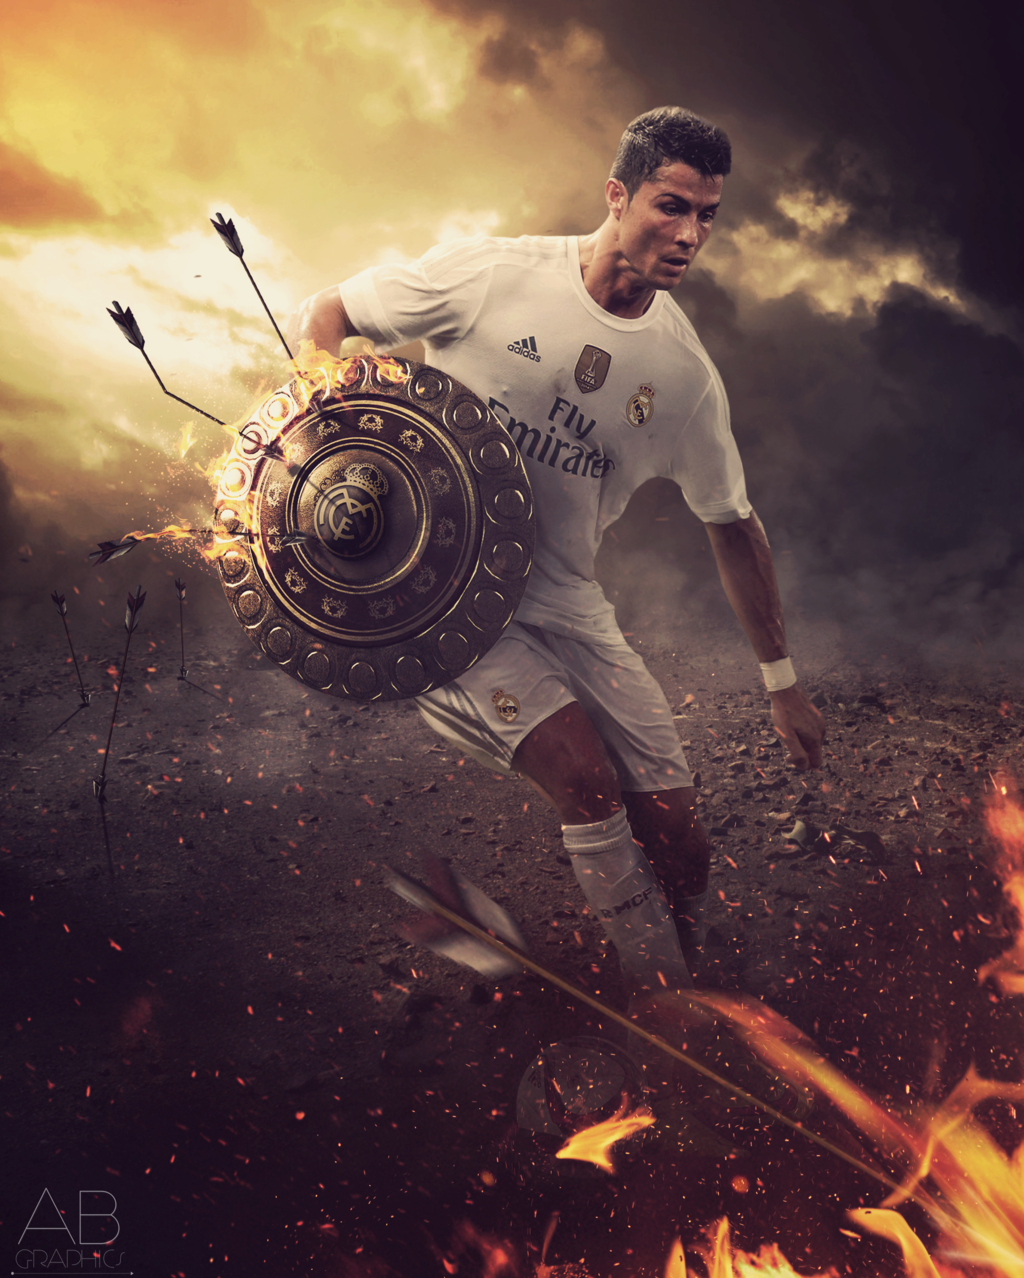 Cristiano Ronaldo - Mars in Aries